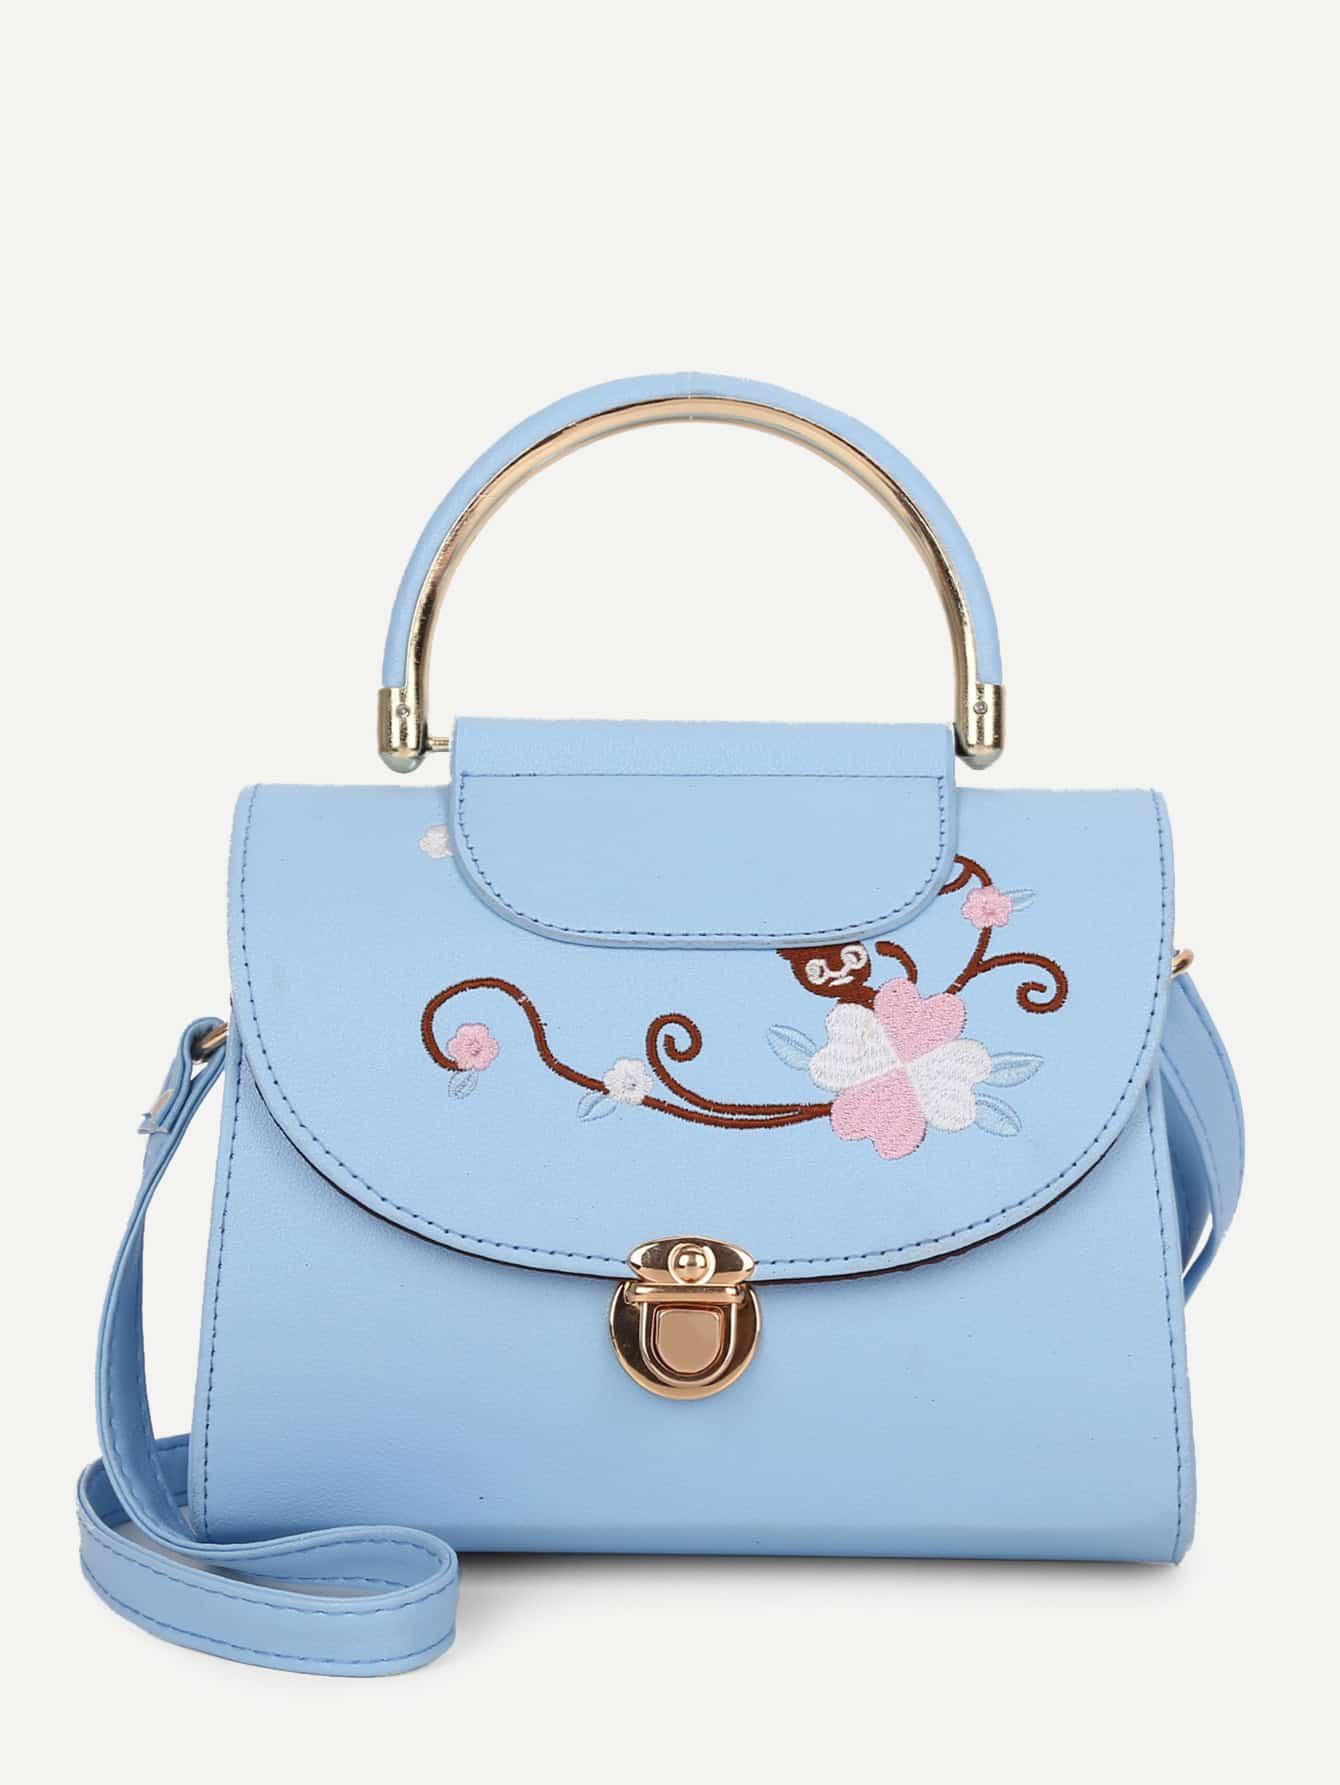 Floral Embroidered Grab Bag